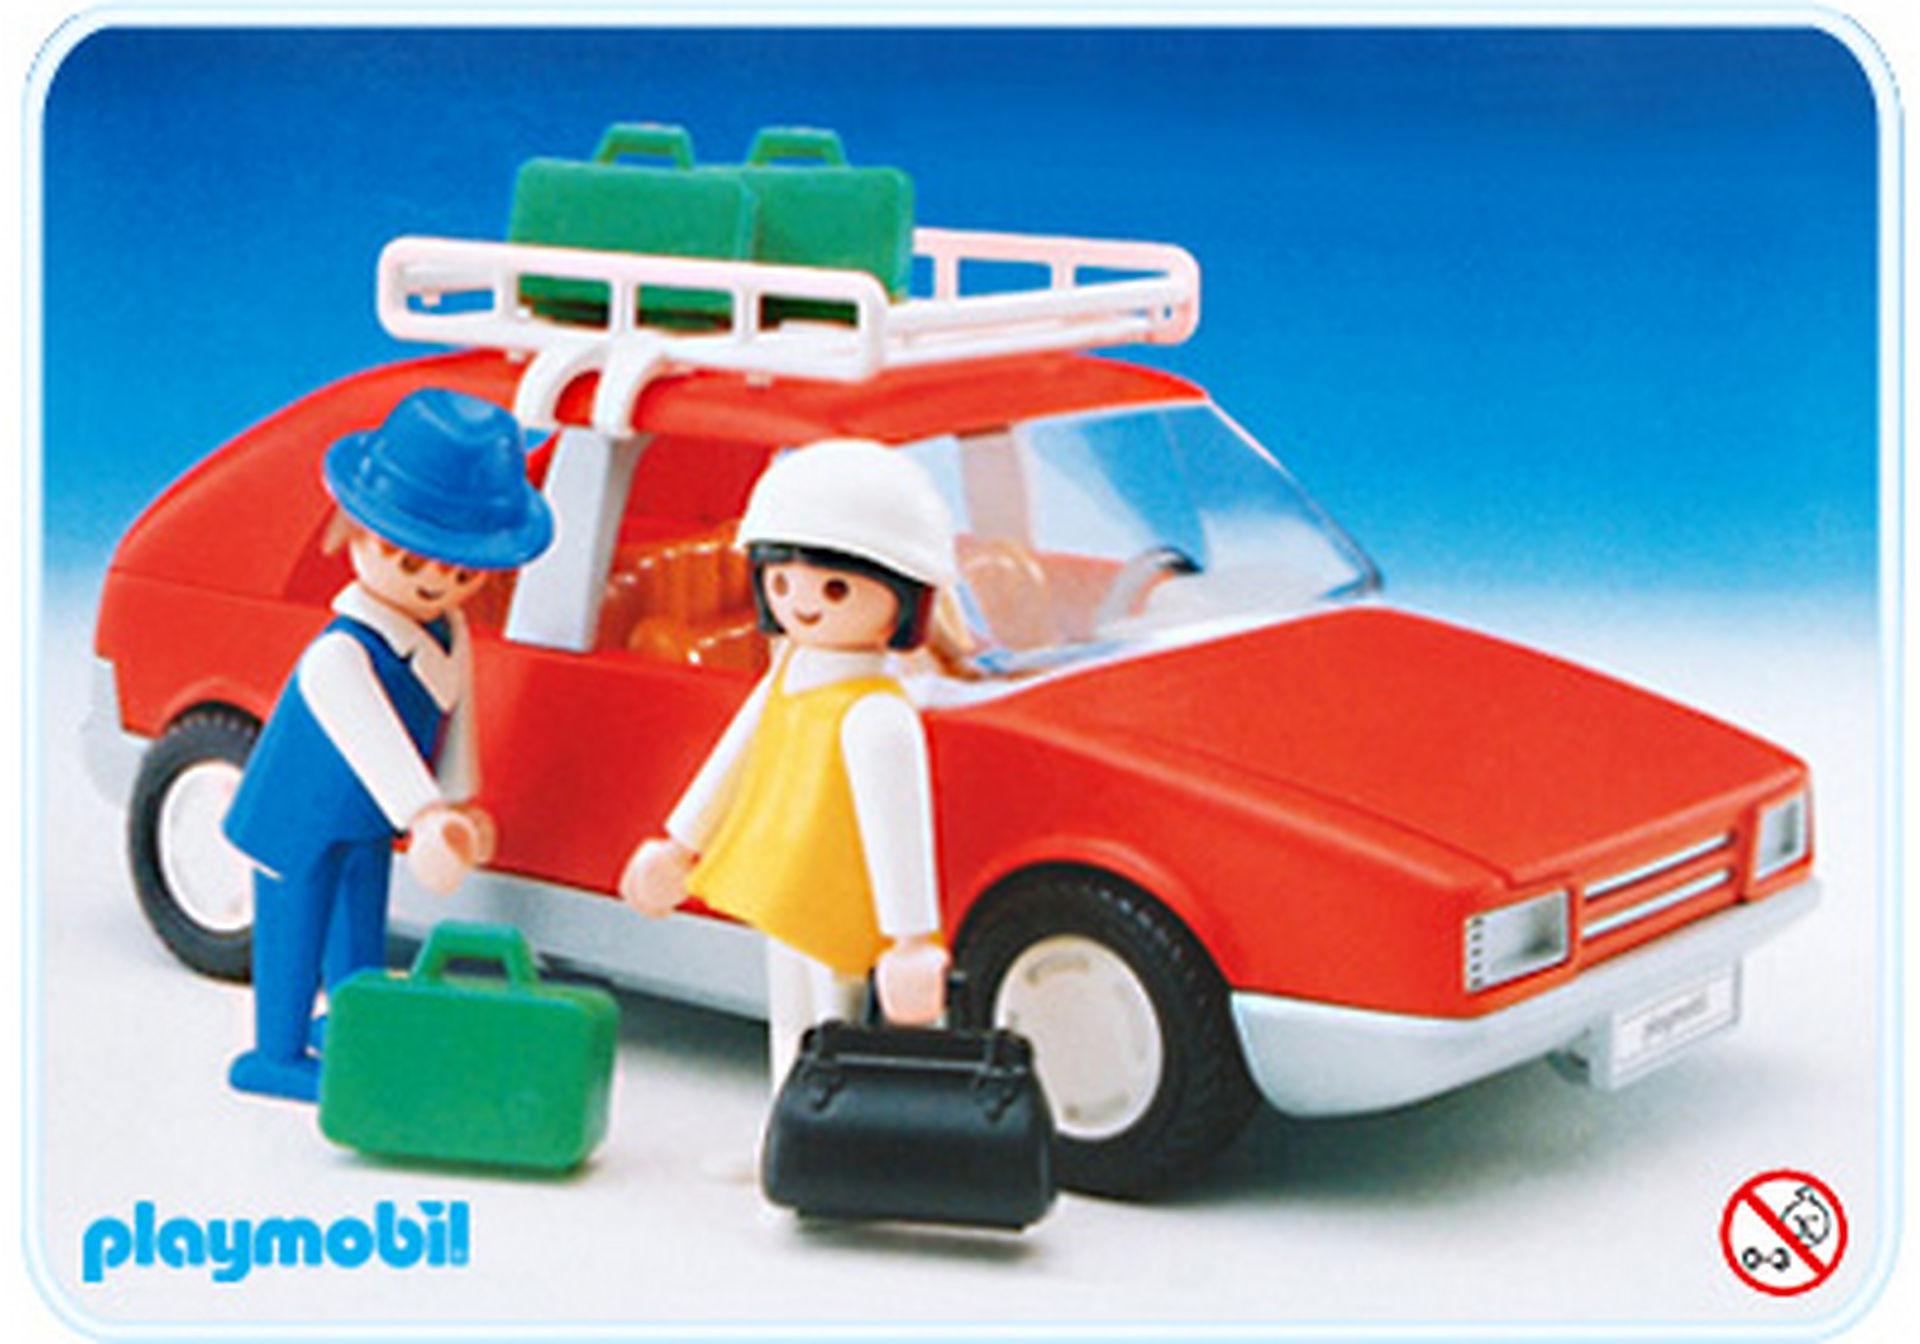 http://media.playmobil.com/i/playmobil/3139-A_product_detail/Reiselimousine